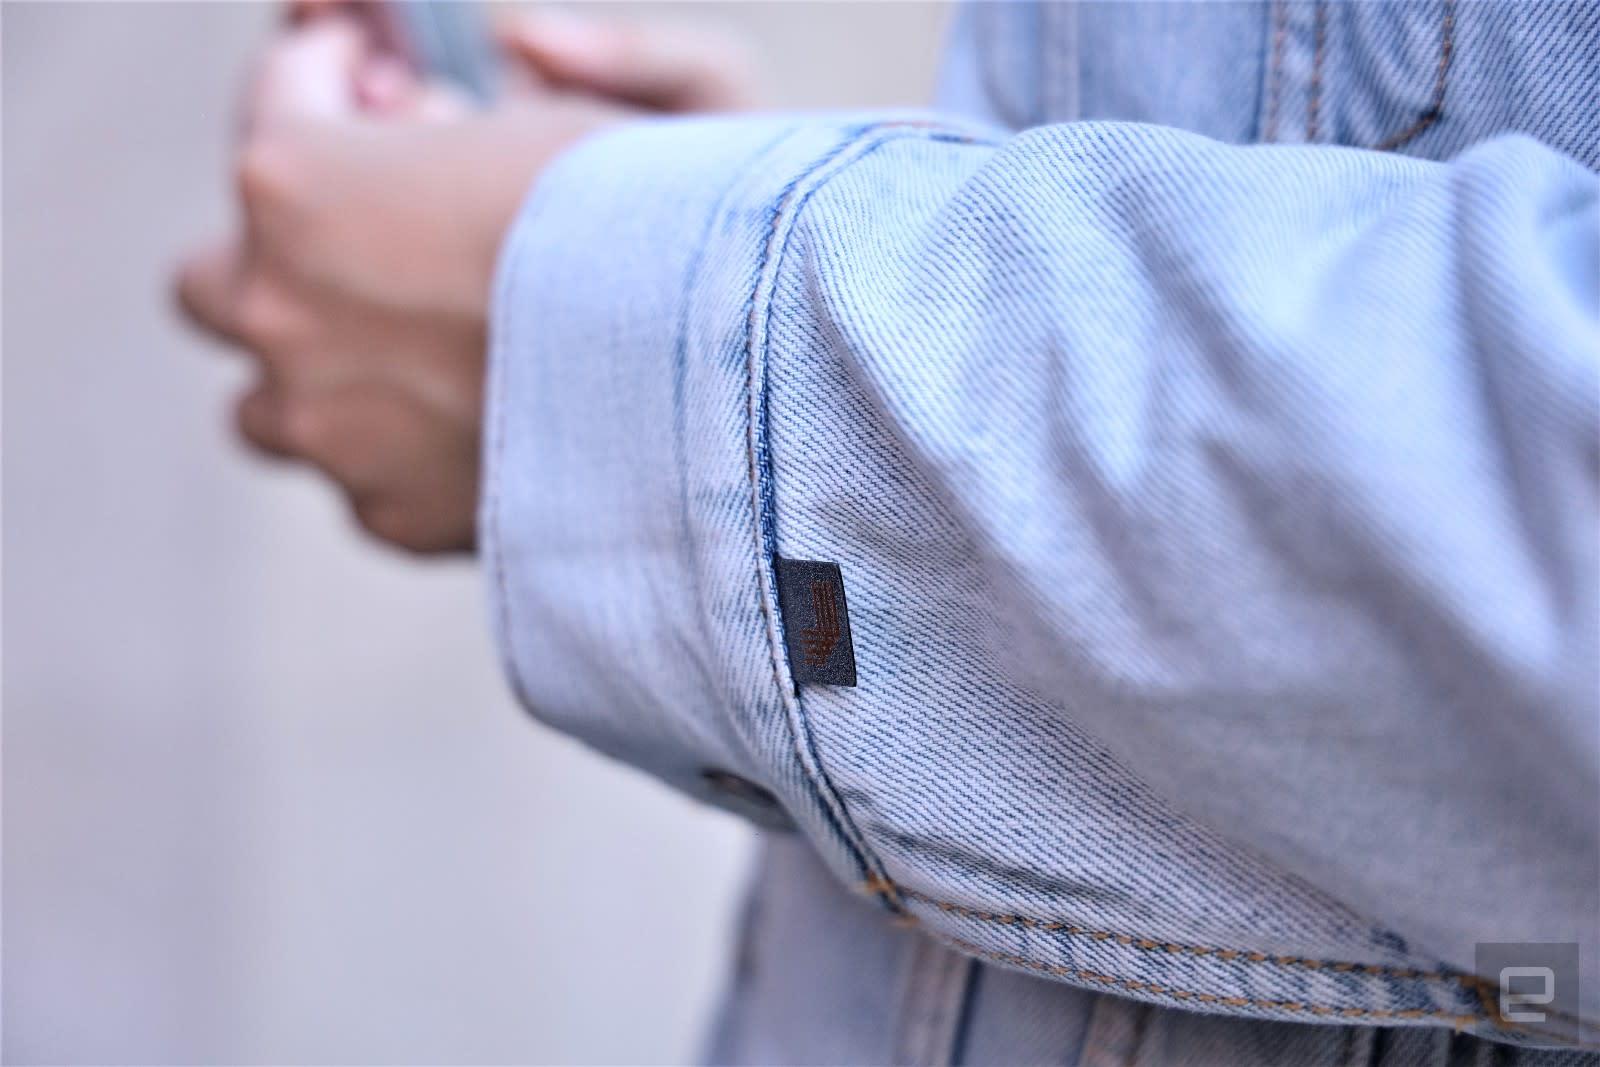 Google Jacquard and Levis Smart Trucker jacket